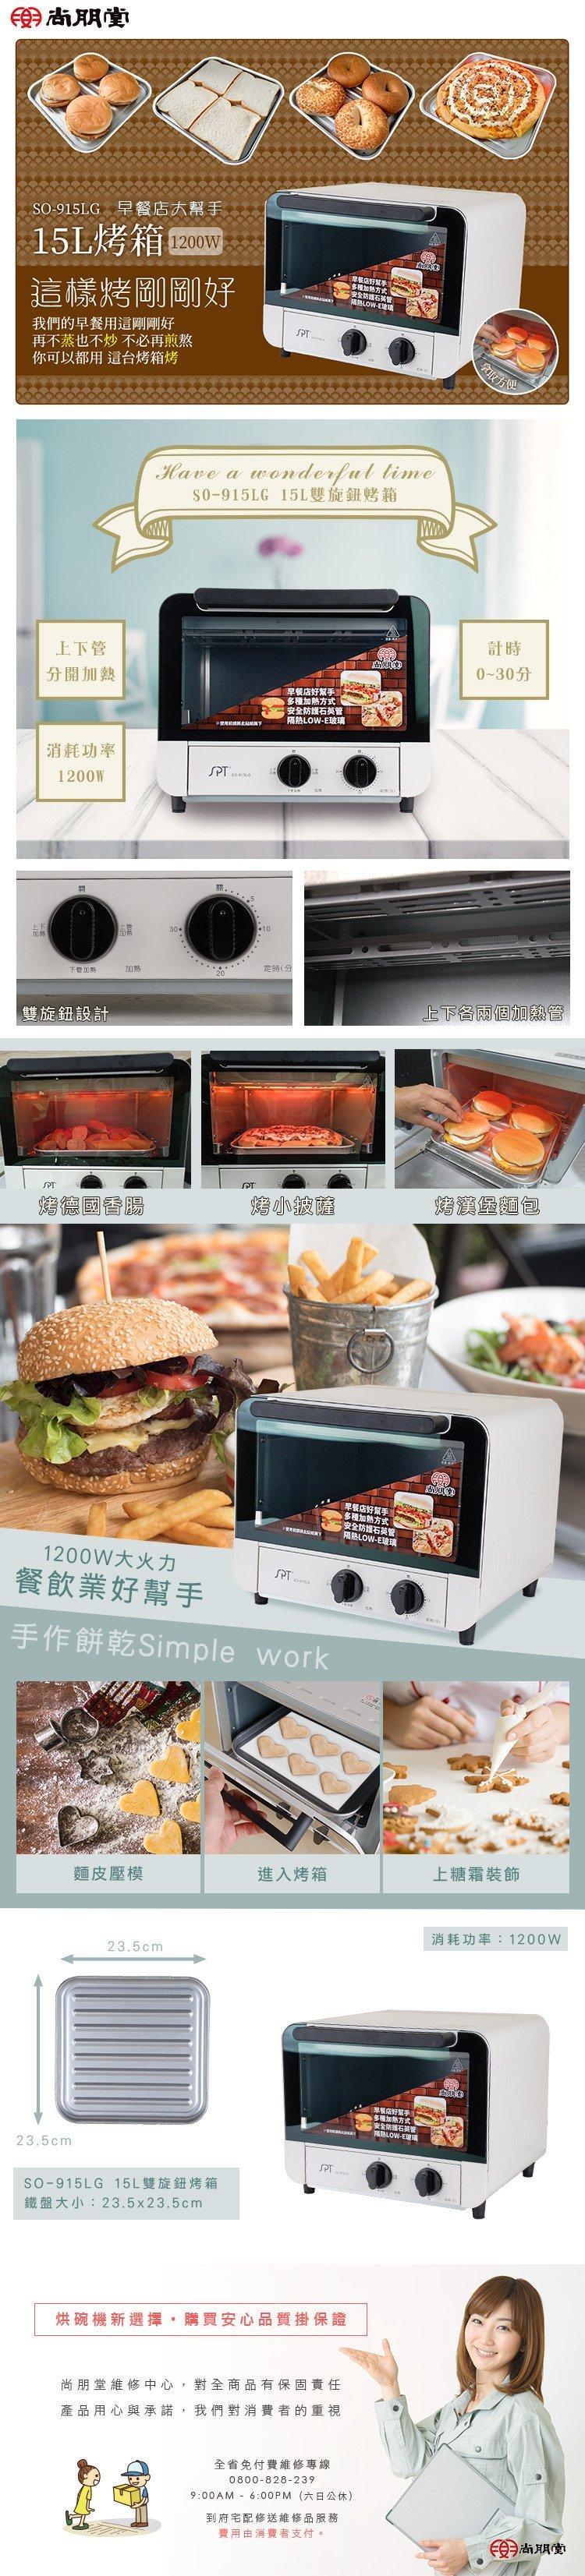 尚朋堂 15L 商用型電烤箱SO-915LG